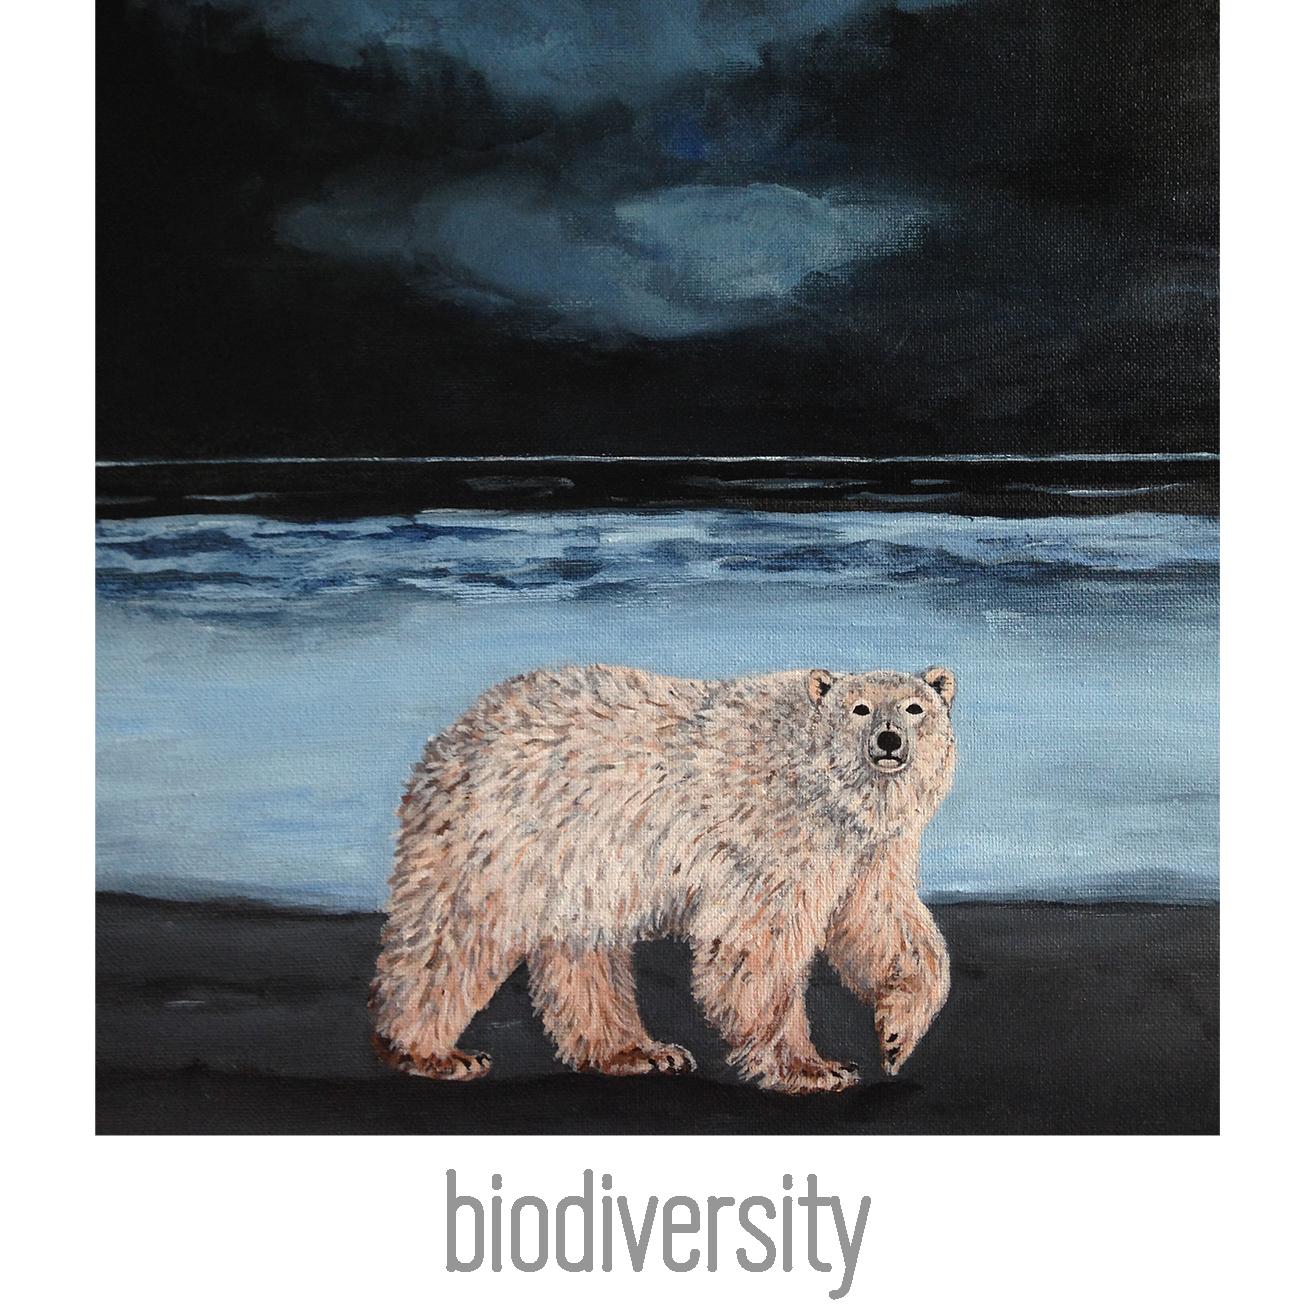 biodiversity-index.jpg